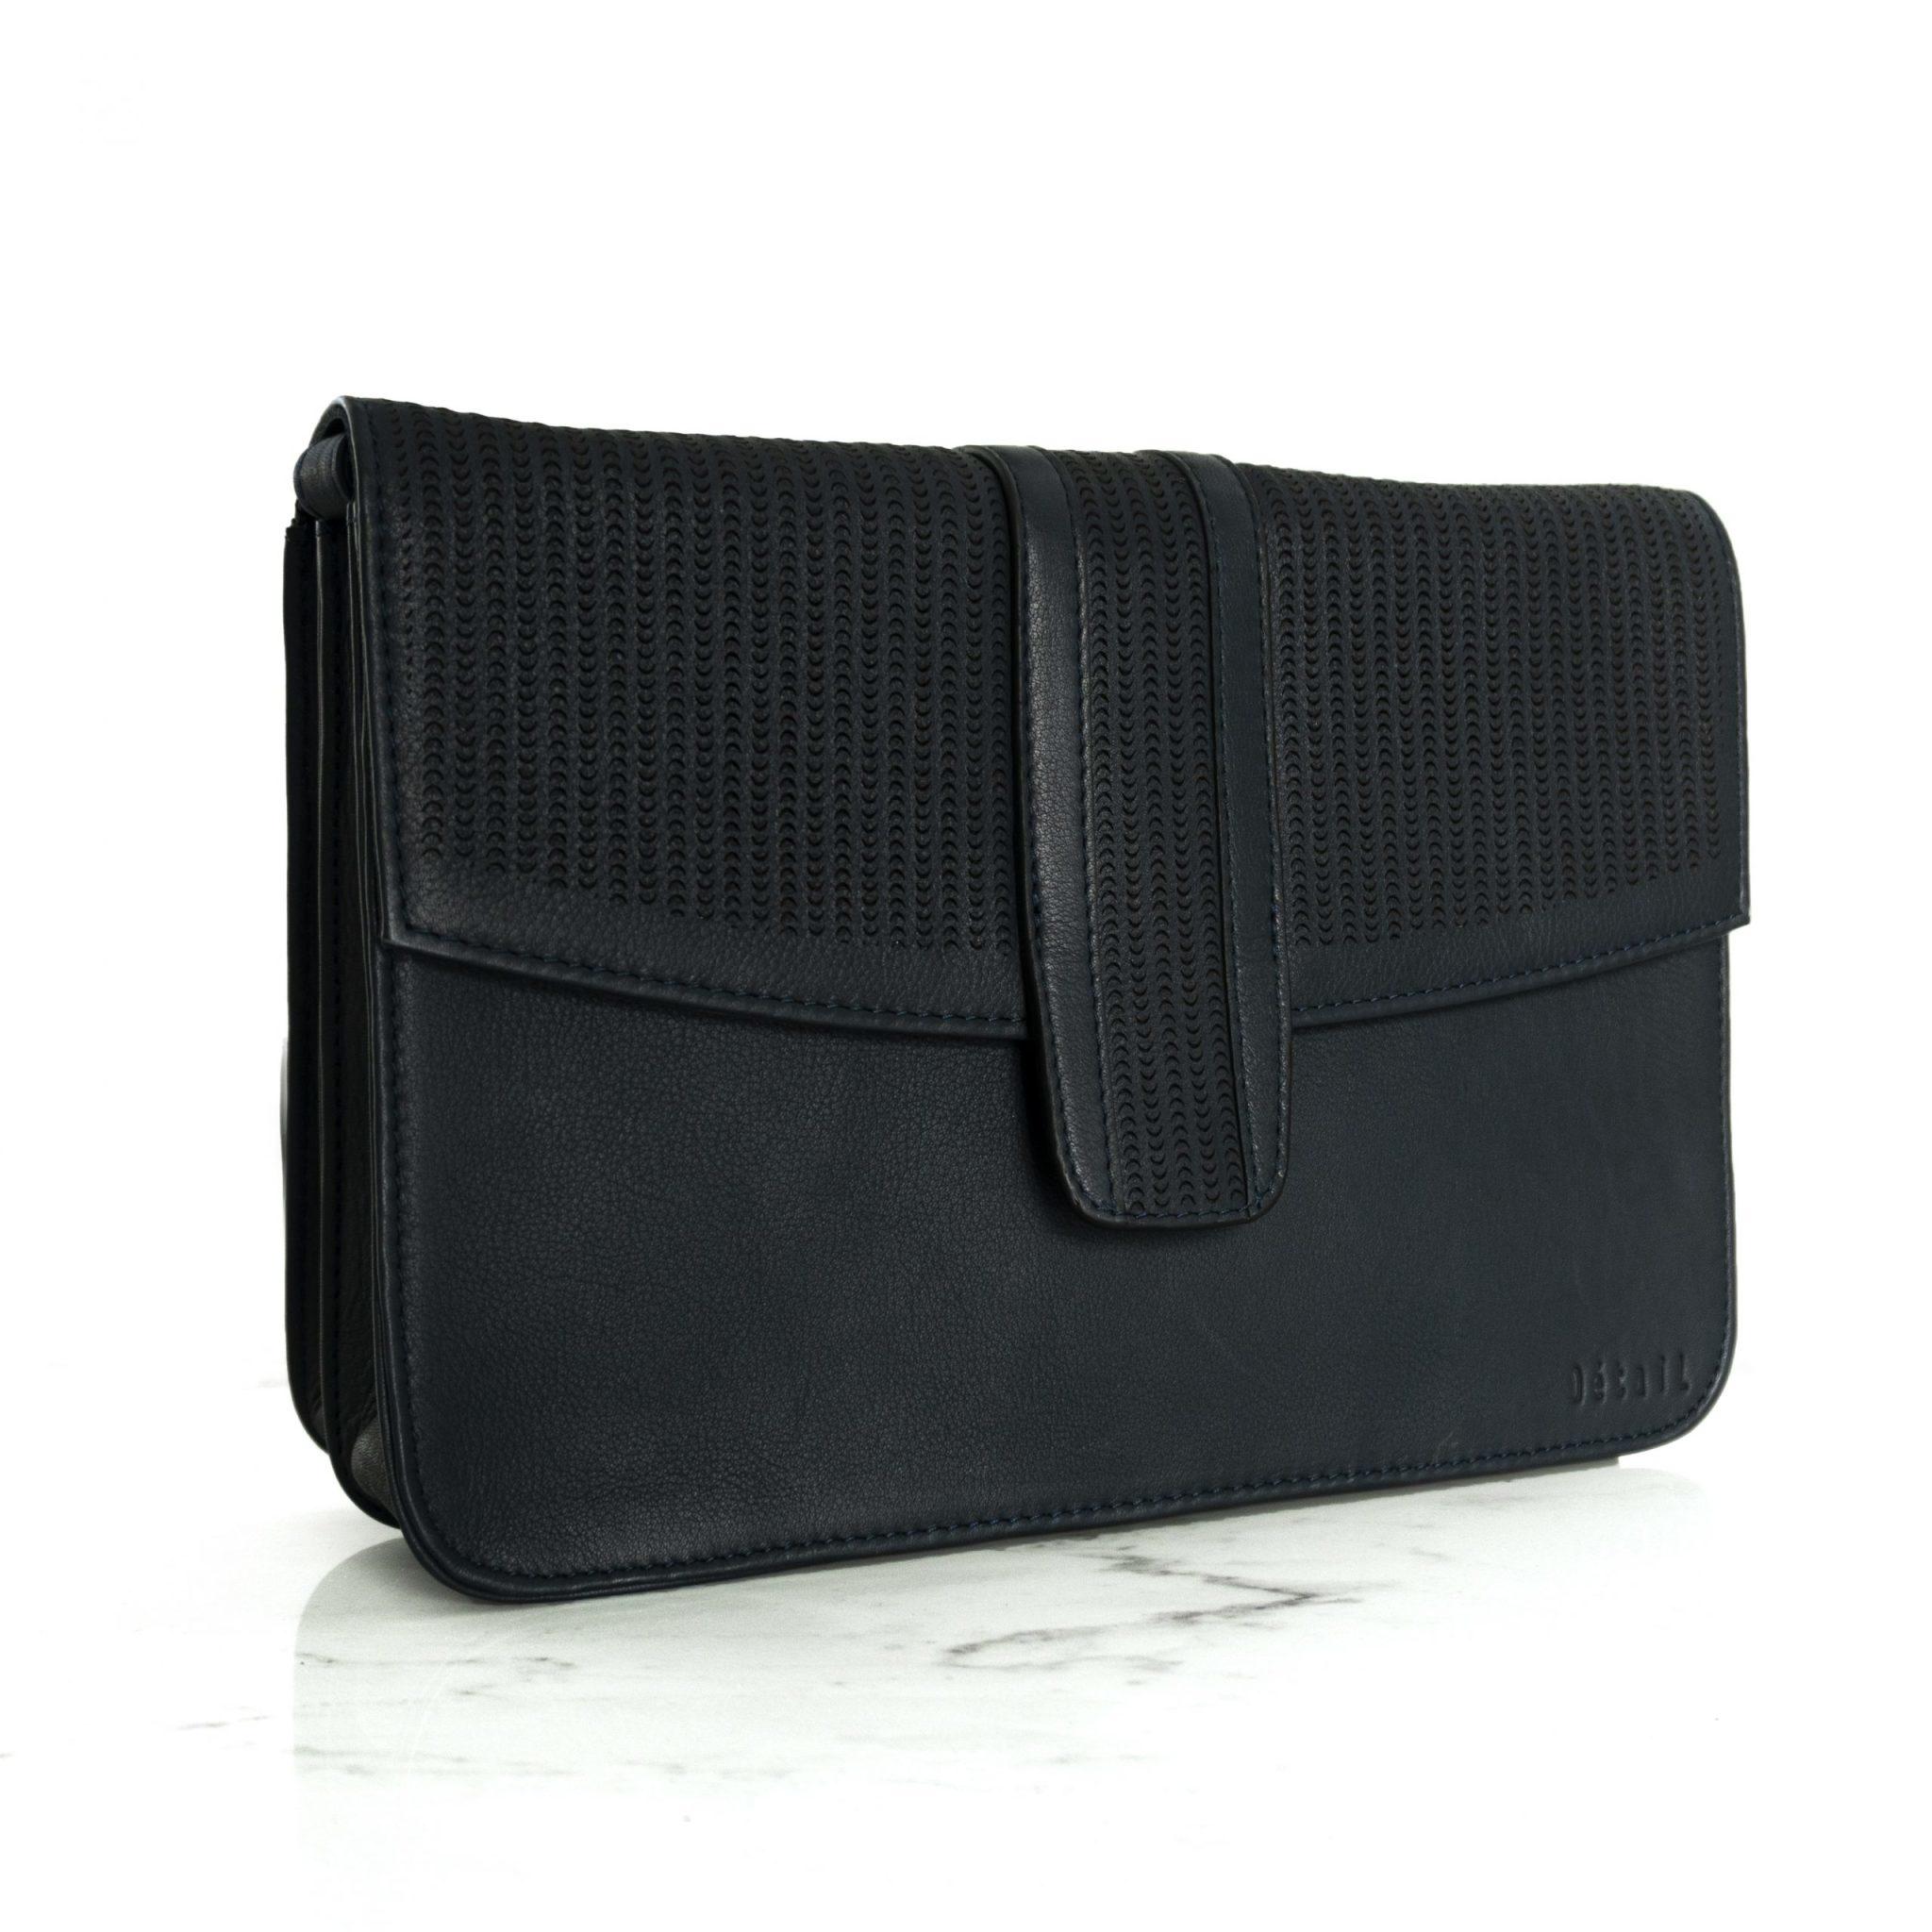 Détail Harmony handbag navy perforated